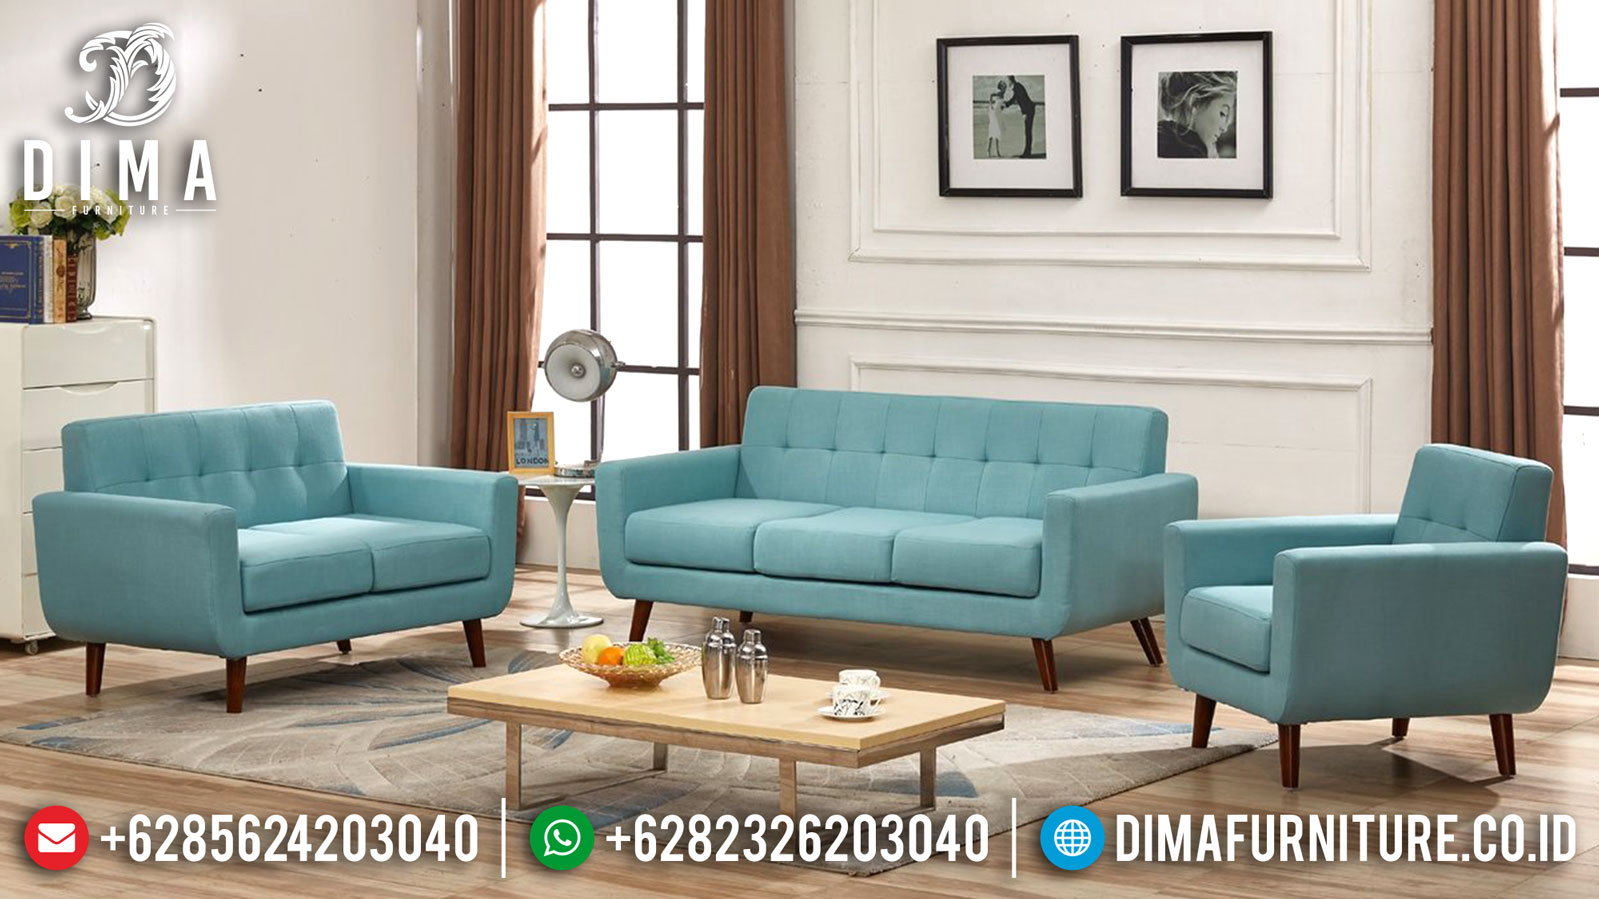 Set Sofa Tamu Minimalis Modern Beautiful Color Velvet New 2020 MMJ-0935